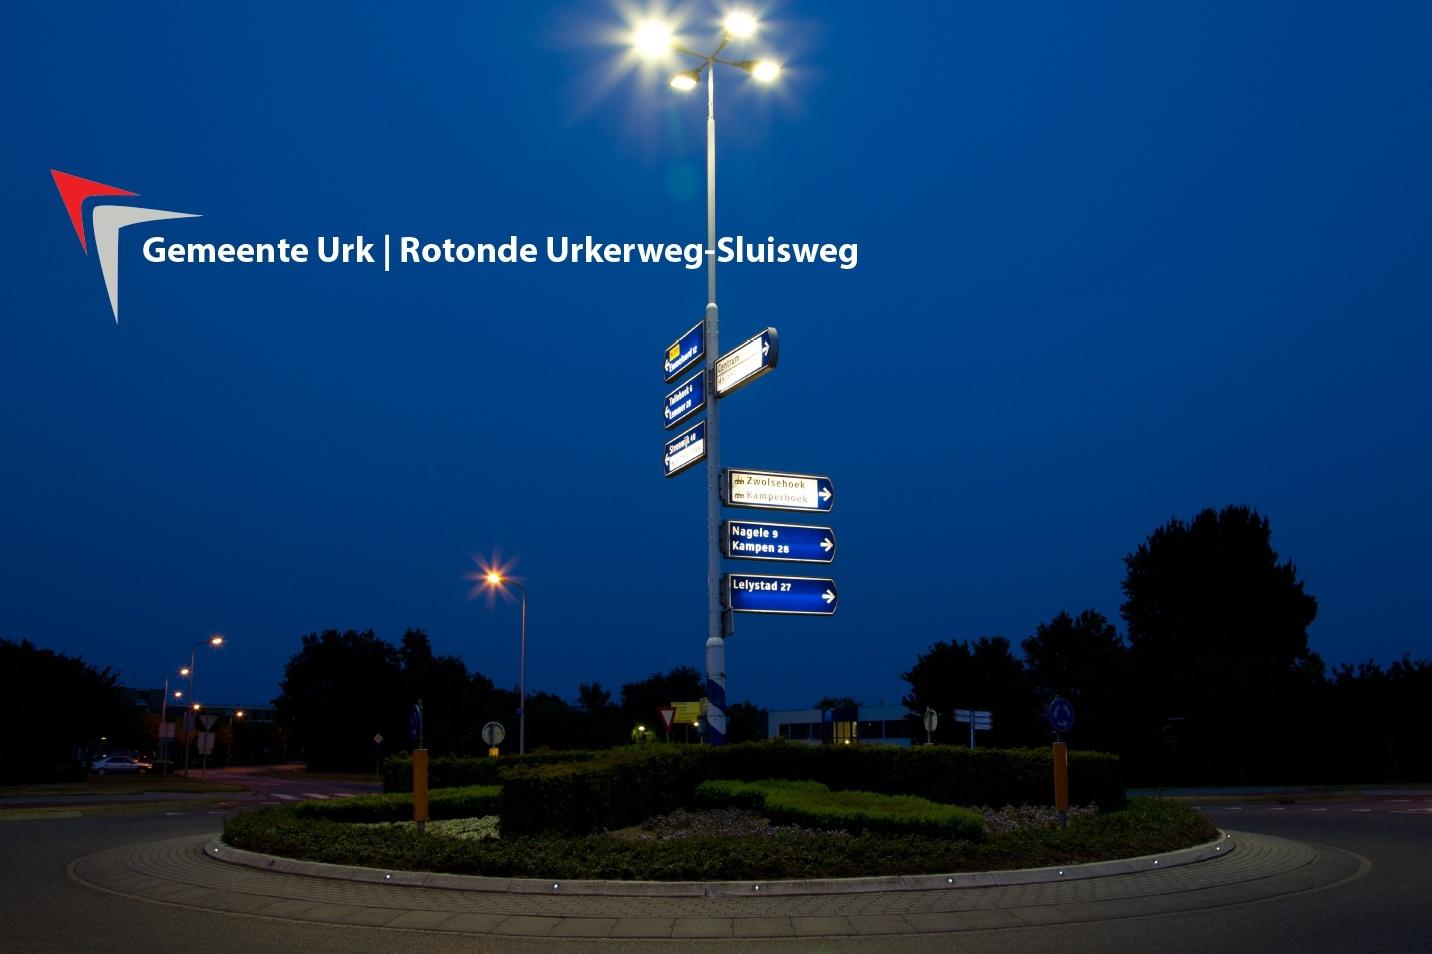 Gemeente Urk Urkerweg-Sluisweg